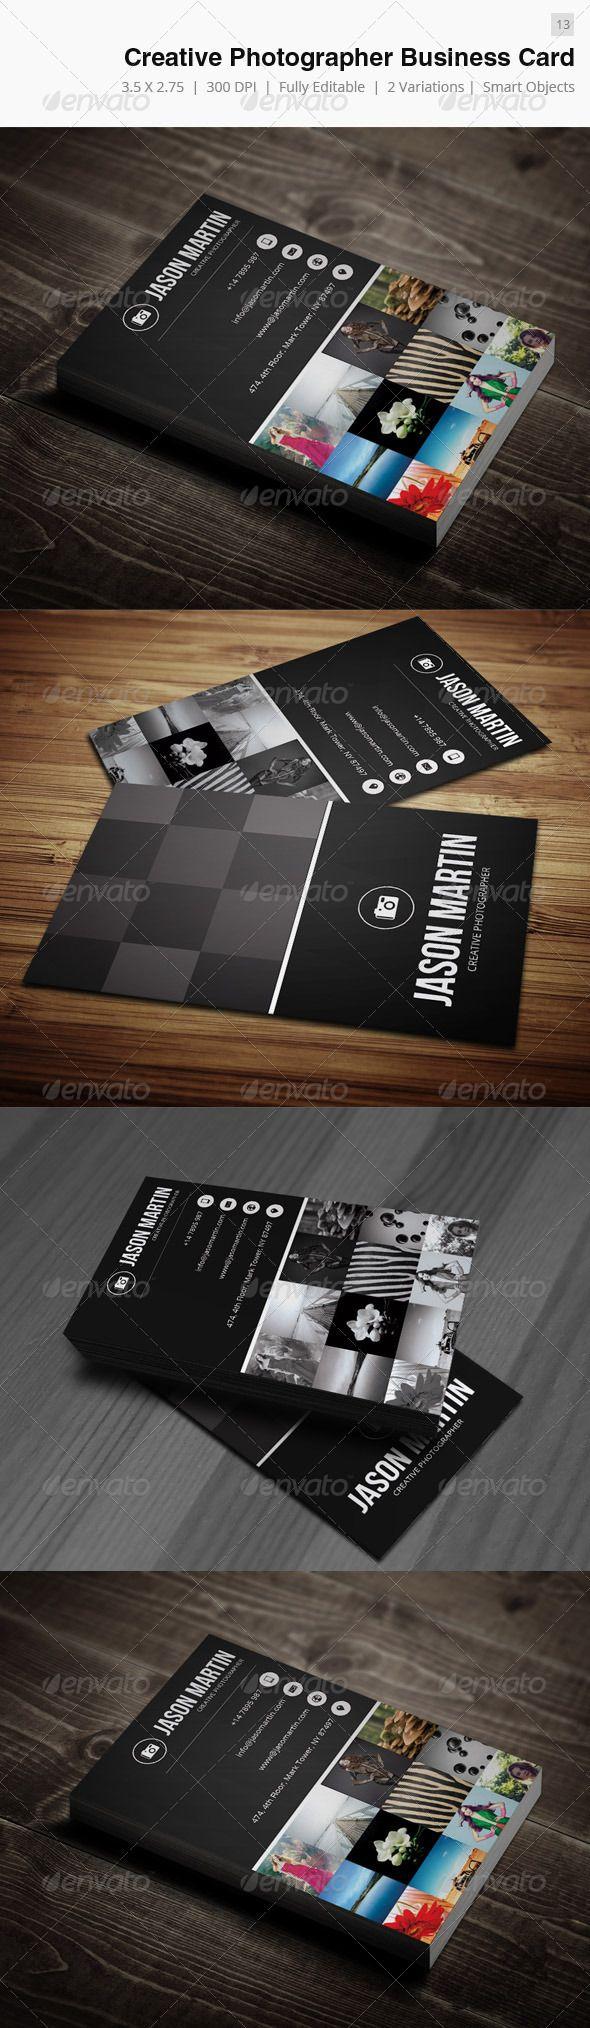 Creative Photographer Business Card - 13 | Photographer business ...